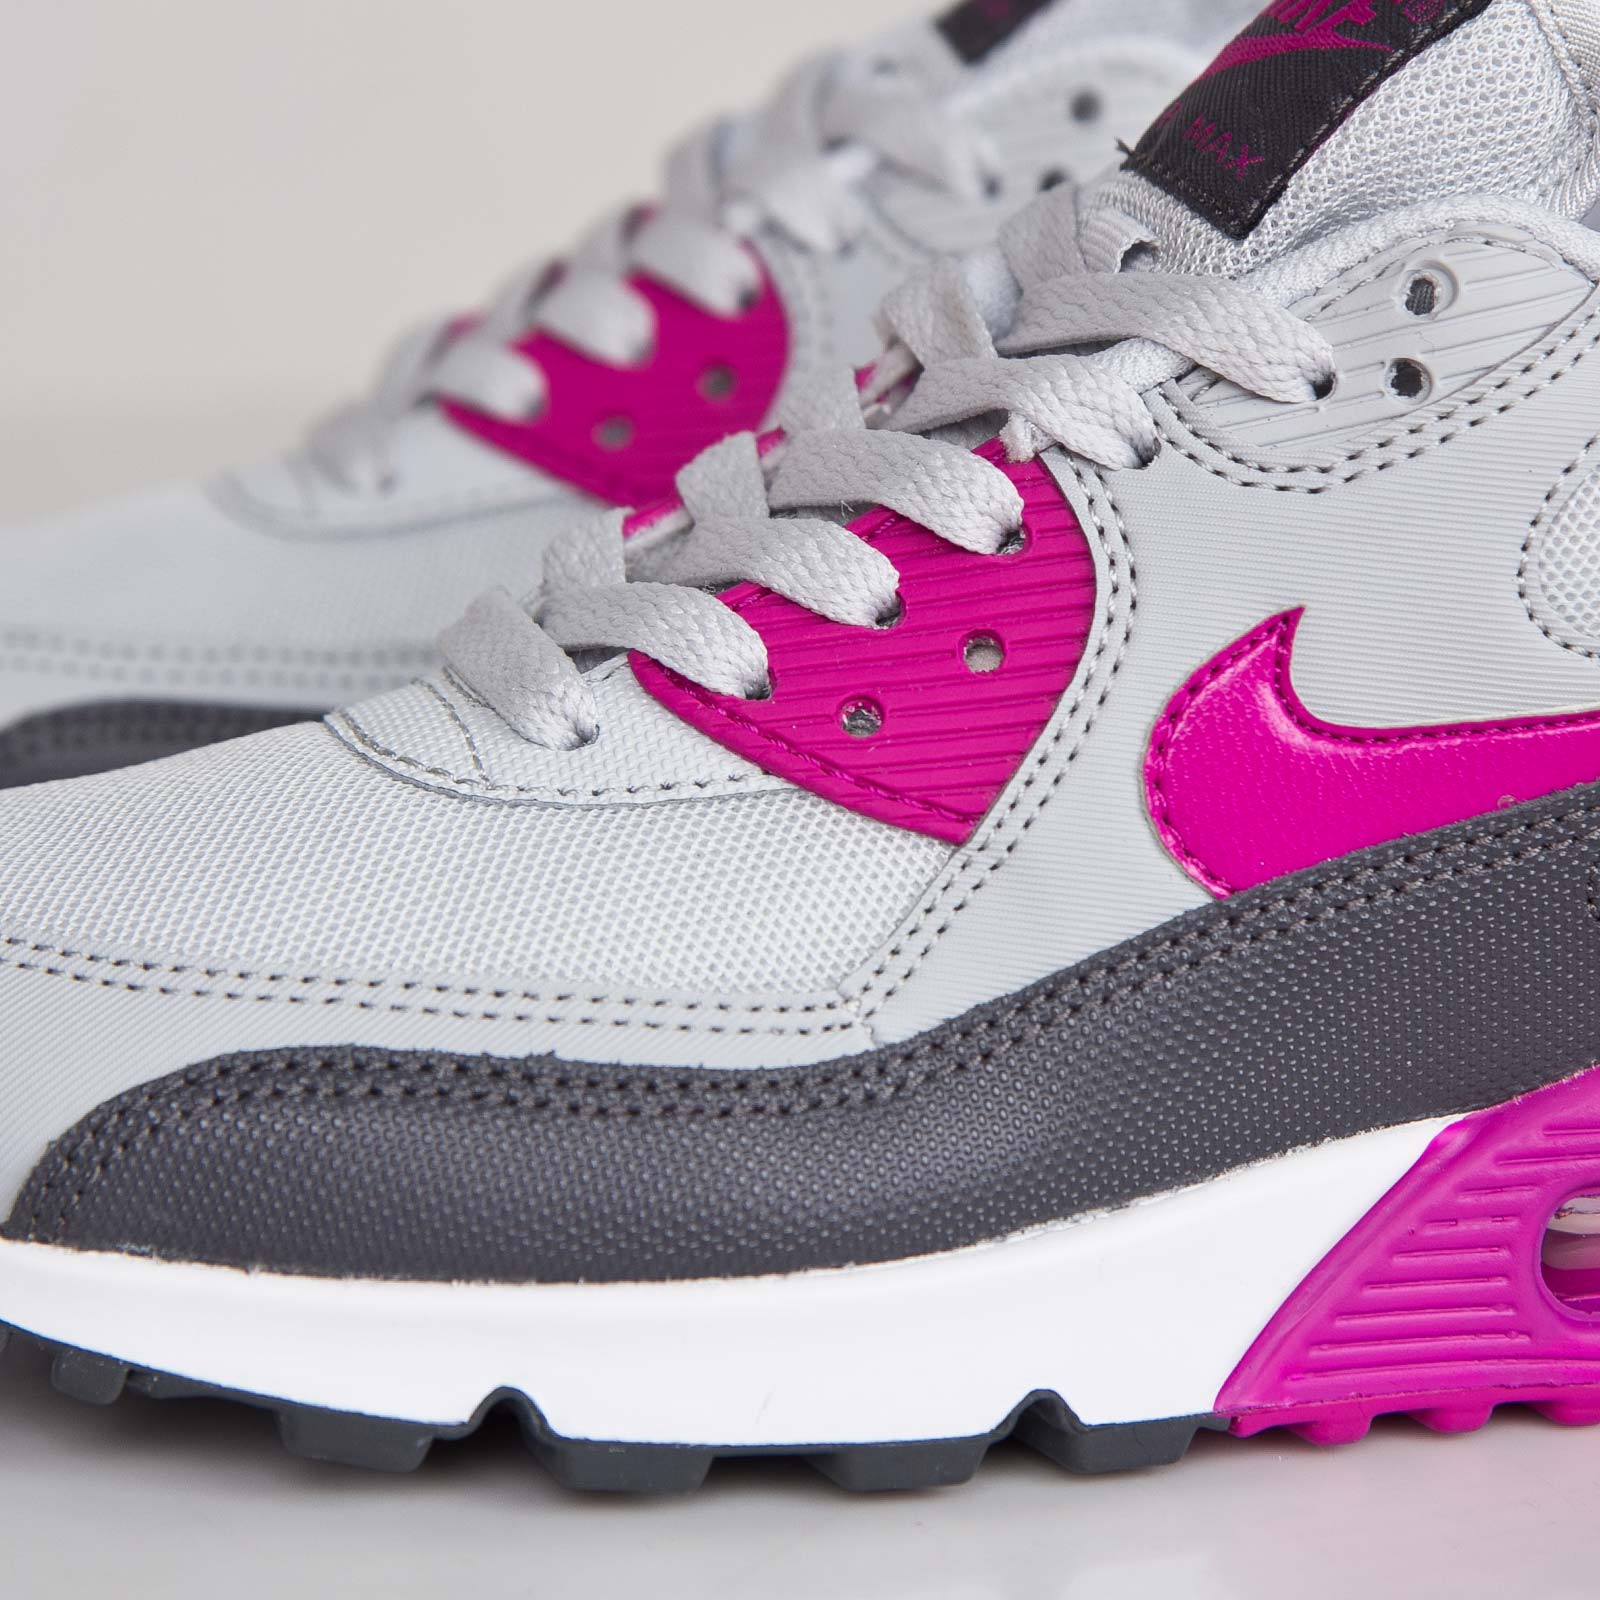 best authentic 07d78 19c24 Nike Wmns Air Max 90 Essential - 616730-013 - Sneakersnstuff   sneakers    streetwear online since 1999